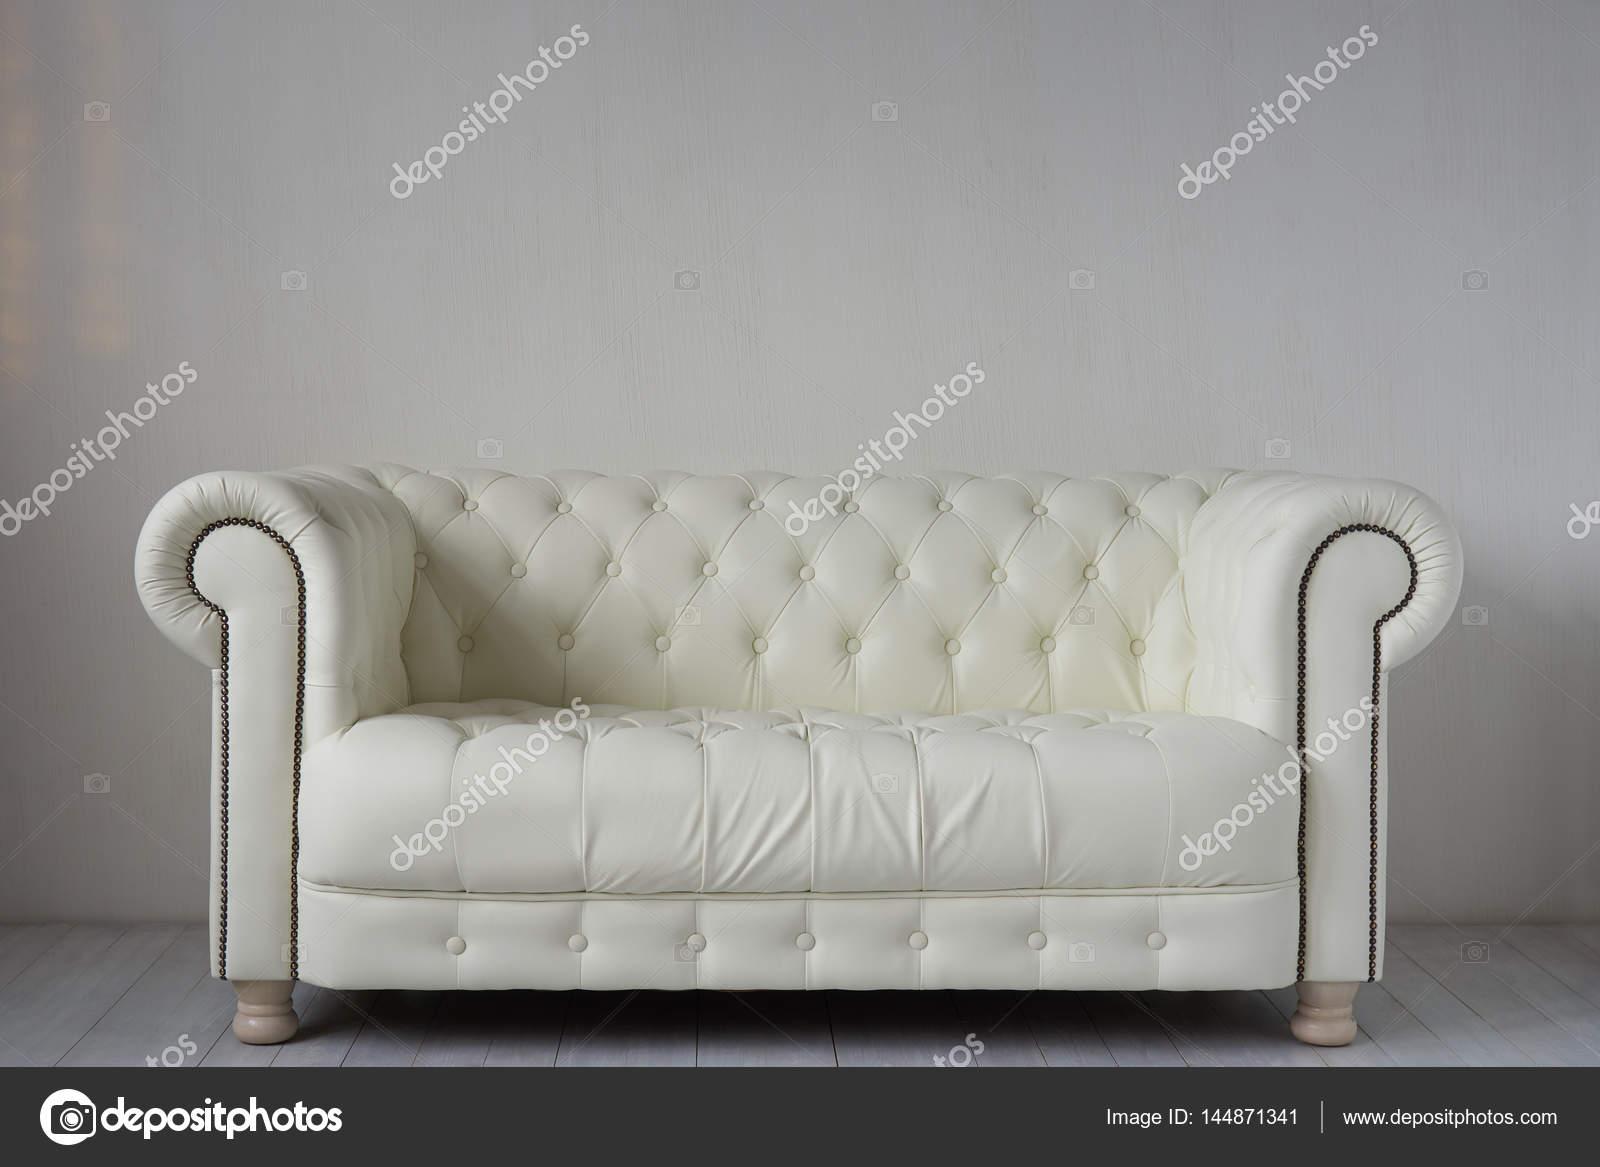 divano in pelle bianco — Foto Stock © photopotam #144871341